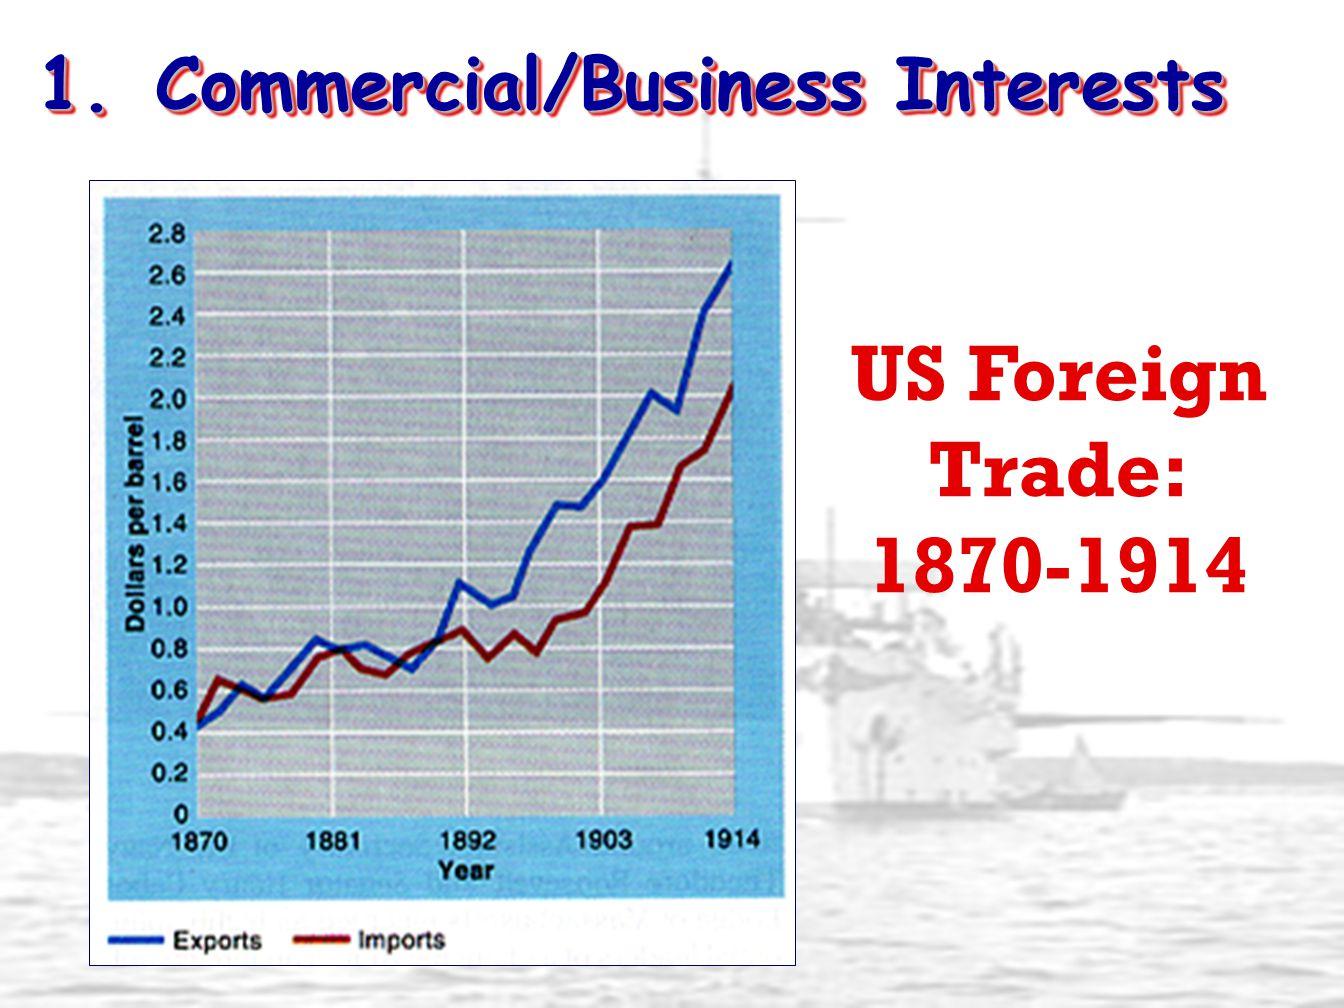 2. Military/Strategic Interests